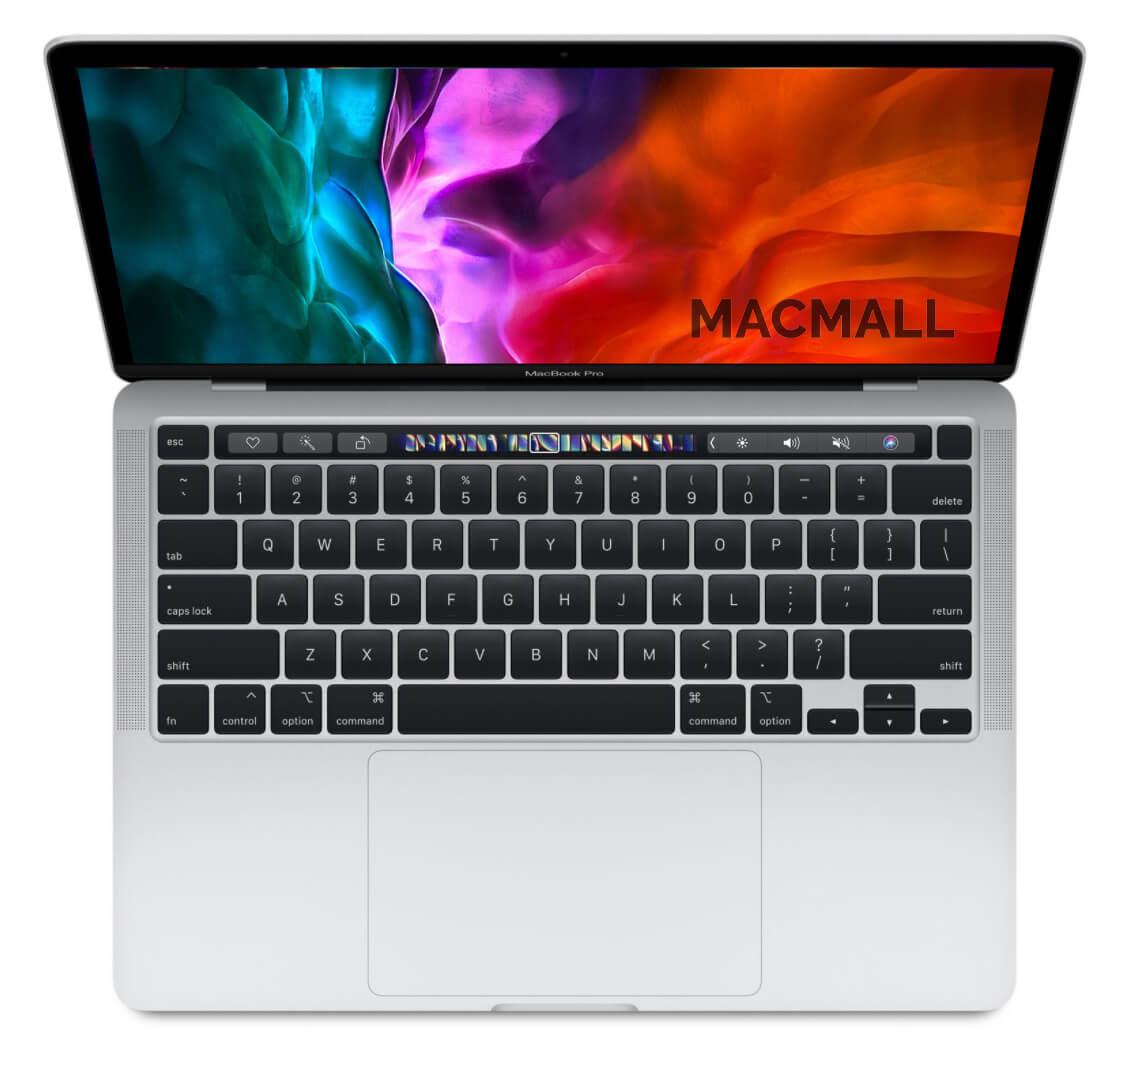 MacBook Pro M1 2020 MYDC2 13-inch Silver 8GB / 512GB / GPU 8-core